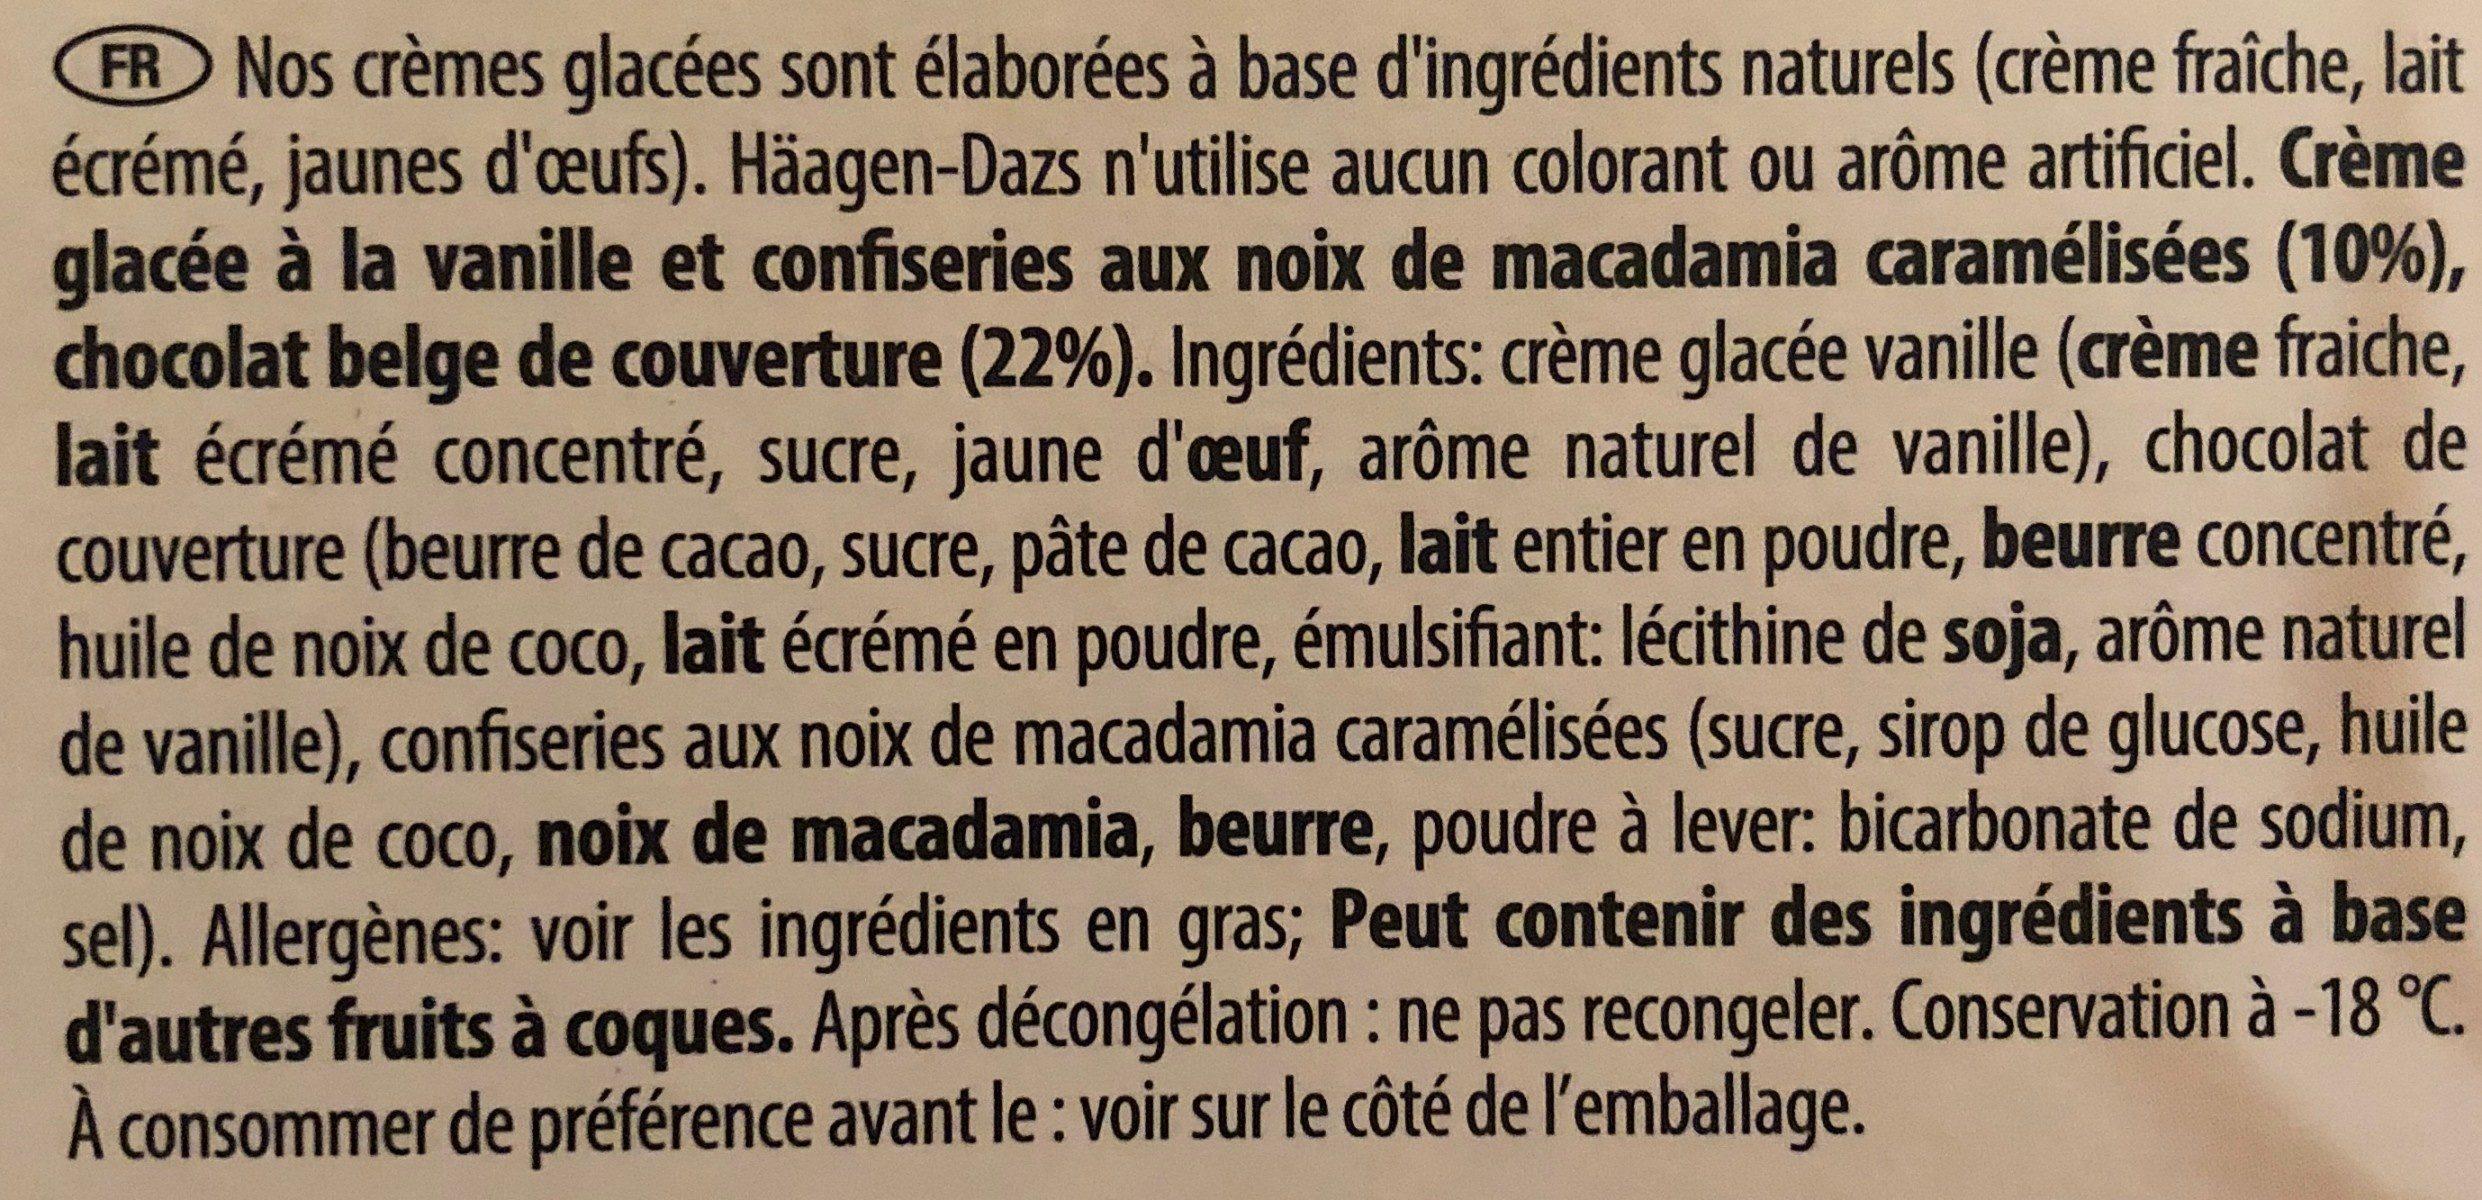 Crème Glacée Macadamia Nut Britle - Ingrediënten